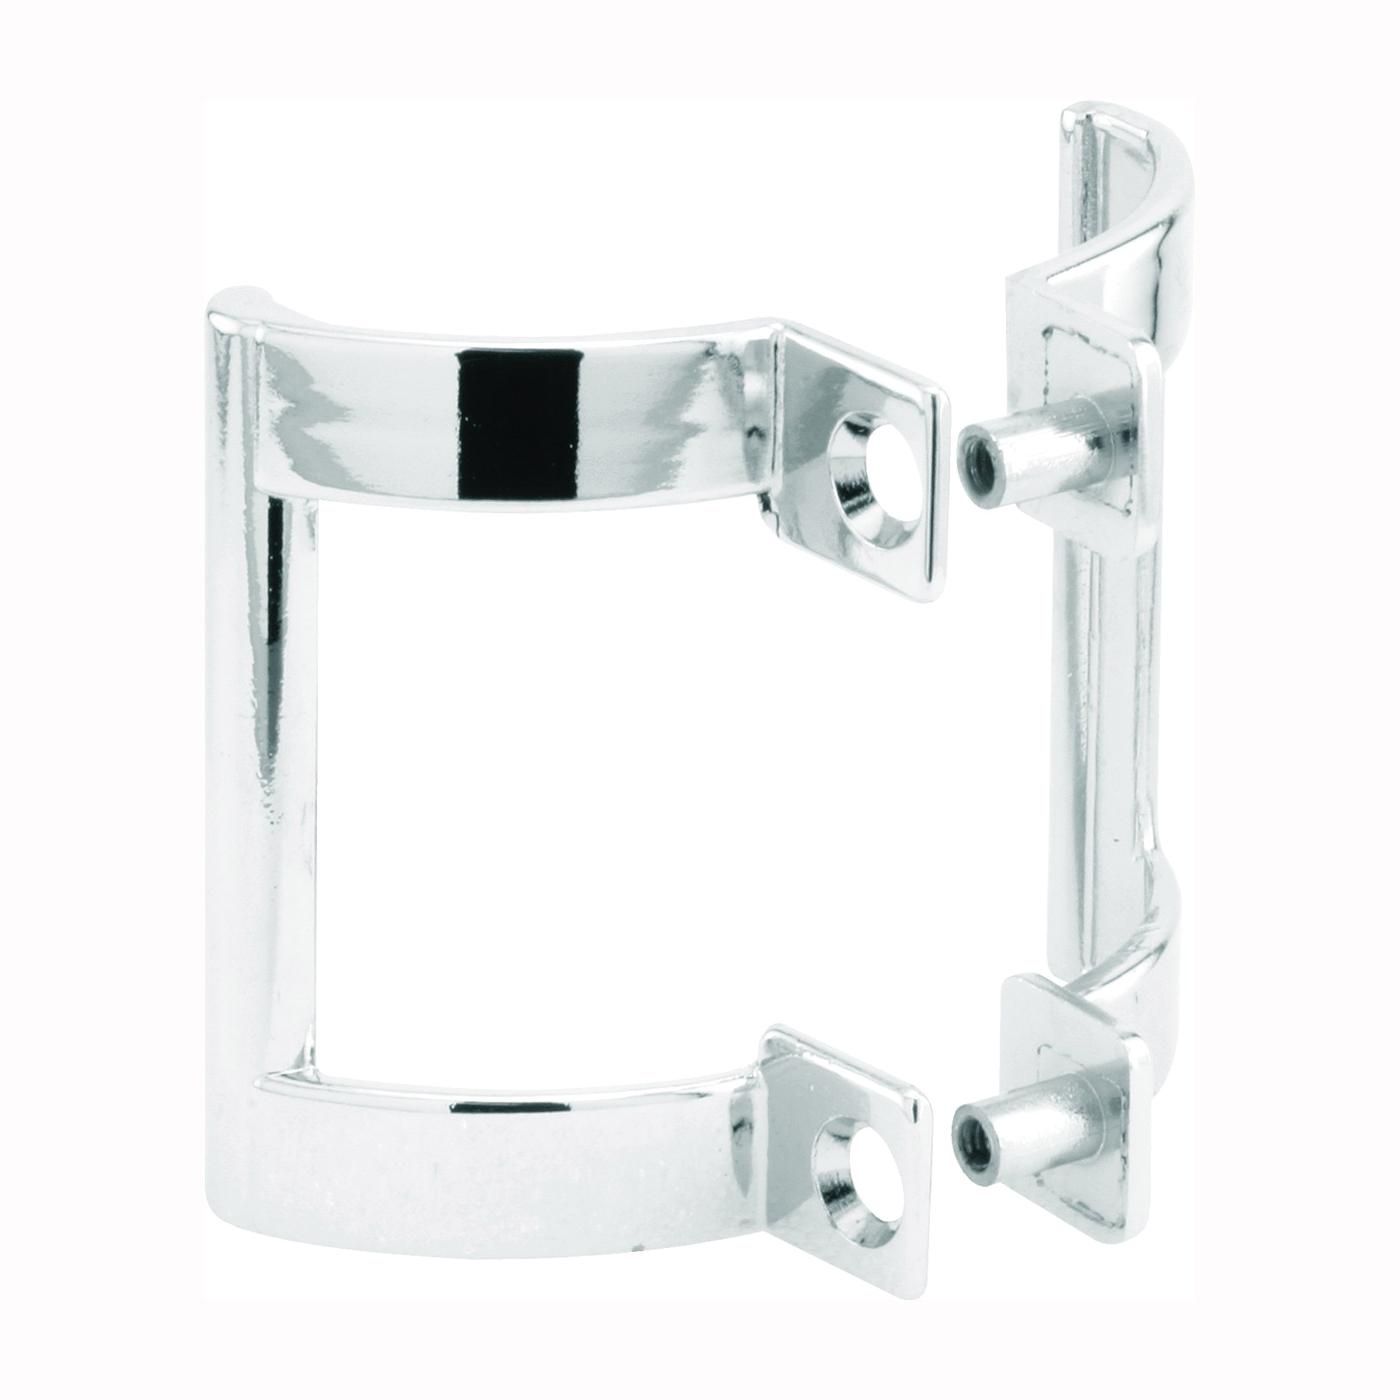 Picture of Prime-Line M 6158 Shower Door Handle Set, Chrome